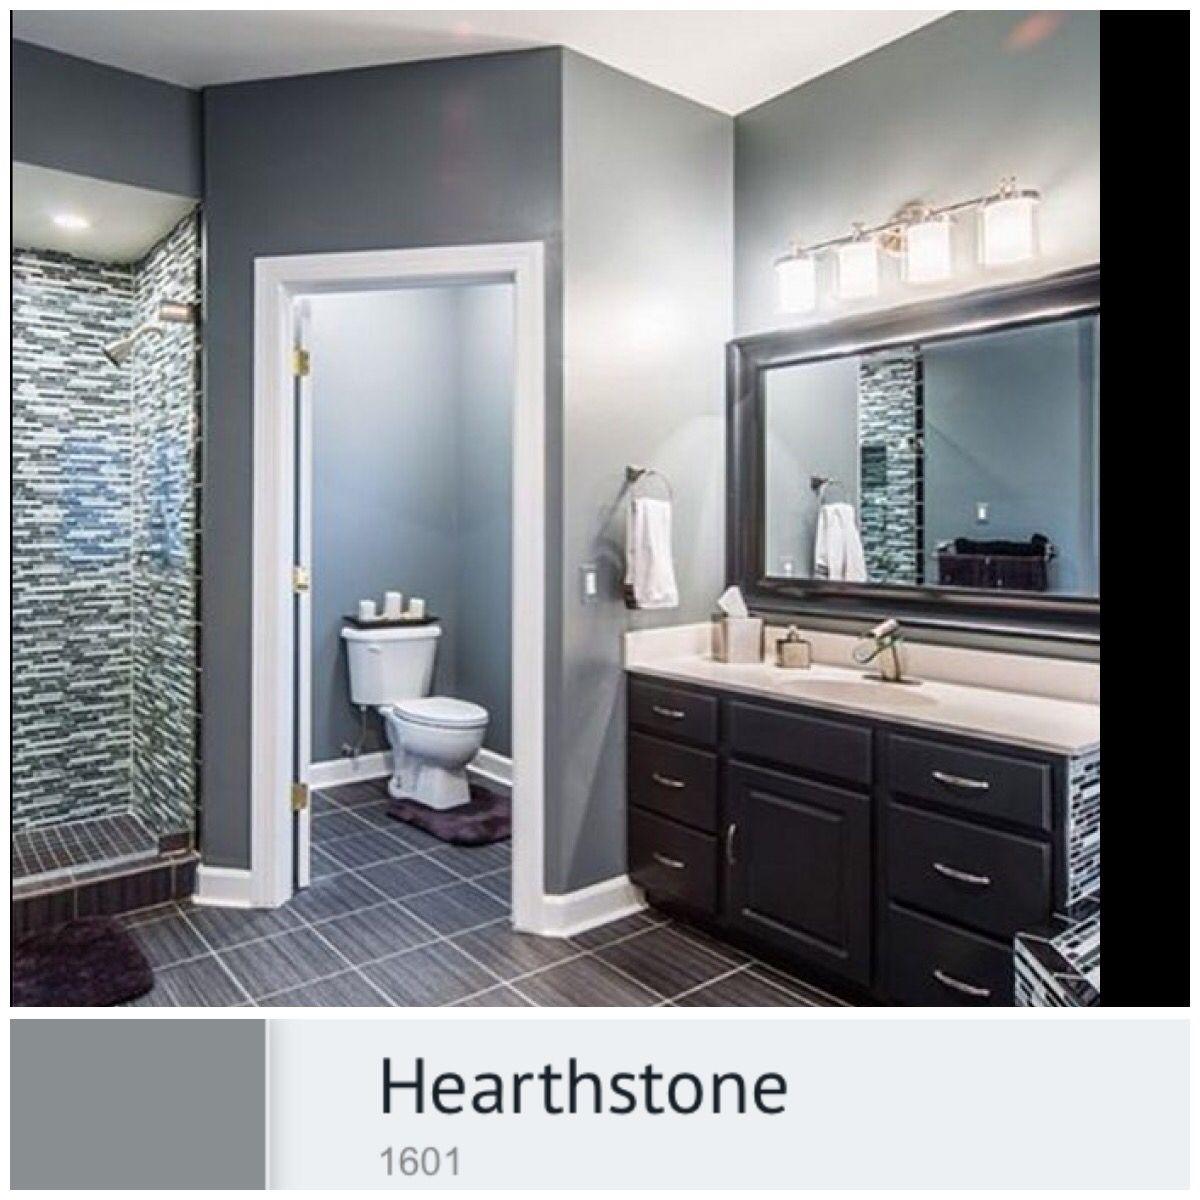 Benjamin moore colors for bathroom - Bathroom Colors Benjamin Moore Hearthstone 1601